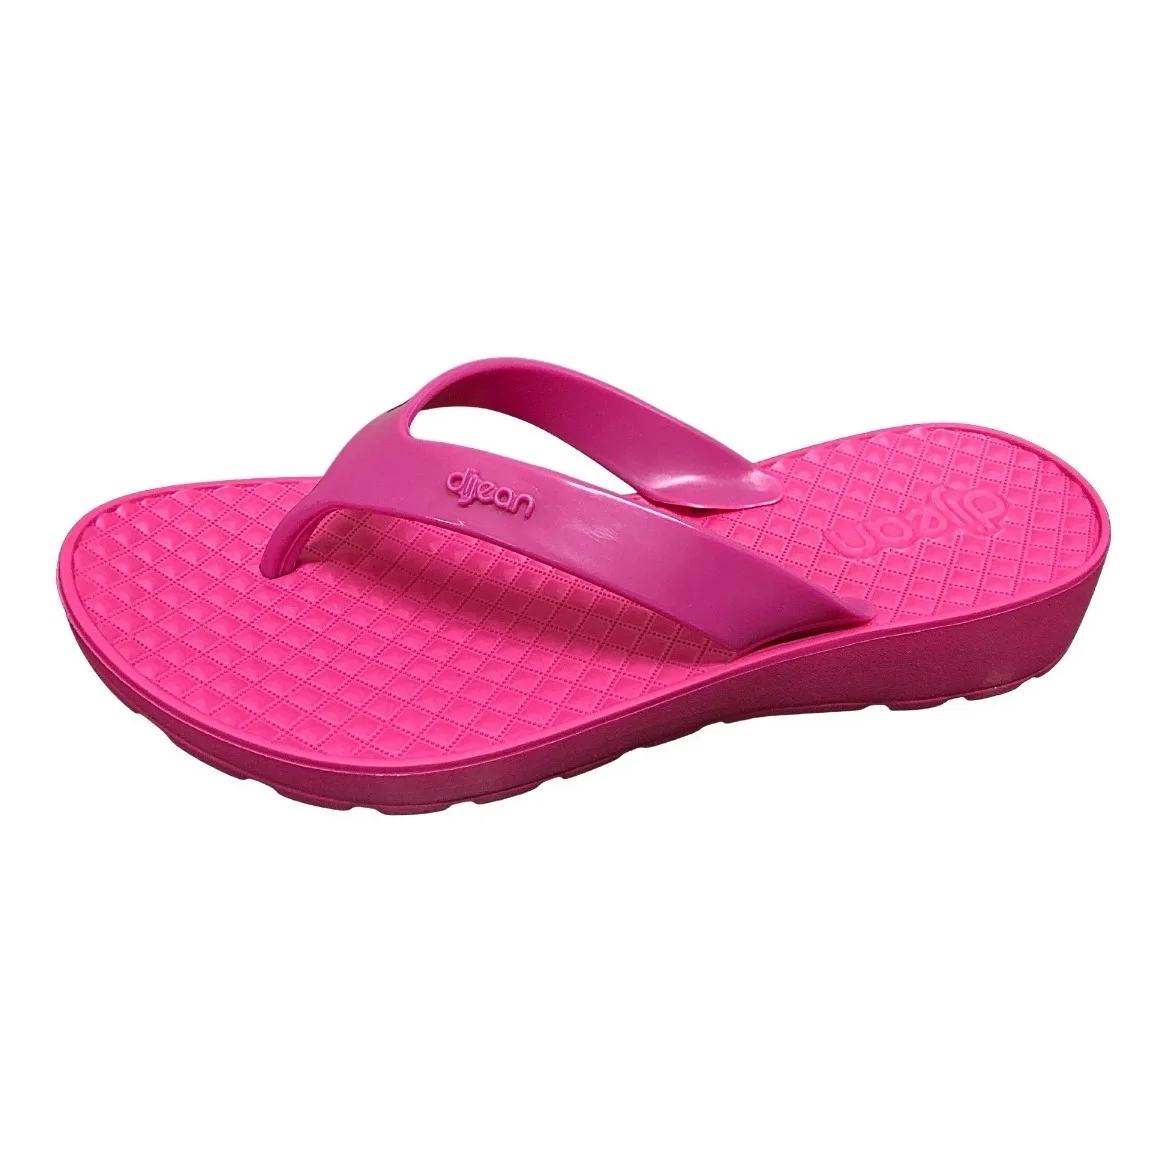 Tamanco Chinelo Dijean DIJ281 - Pink